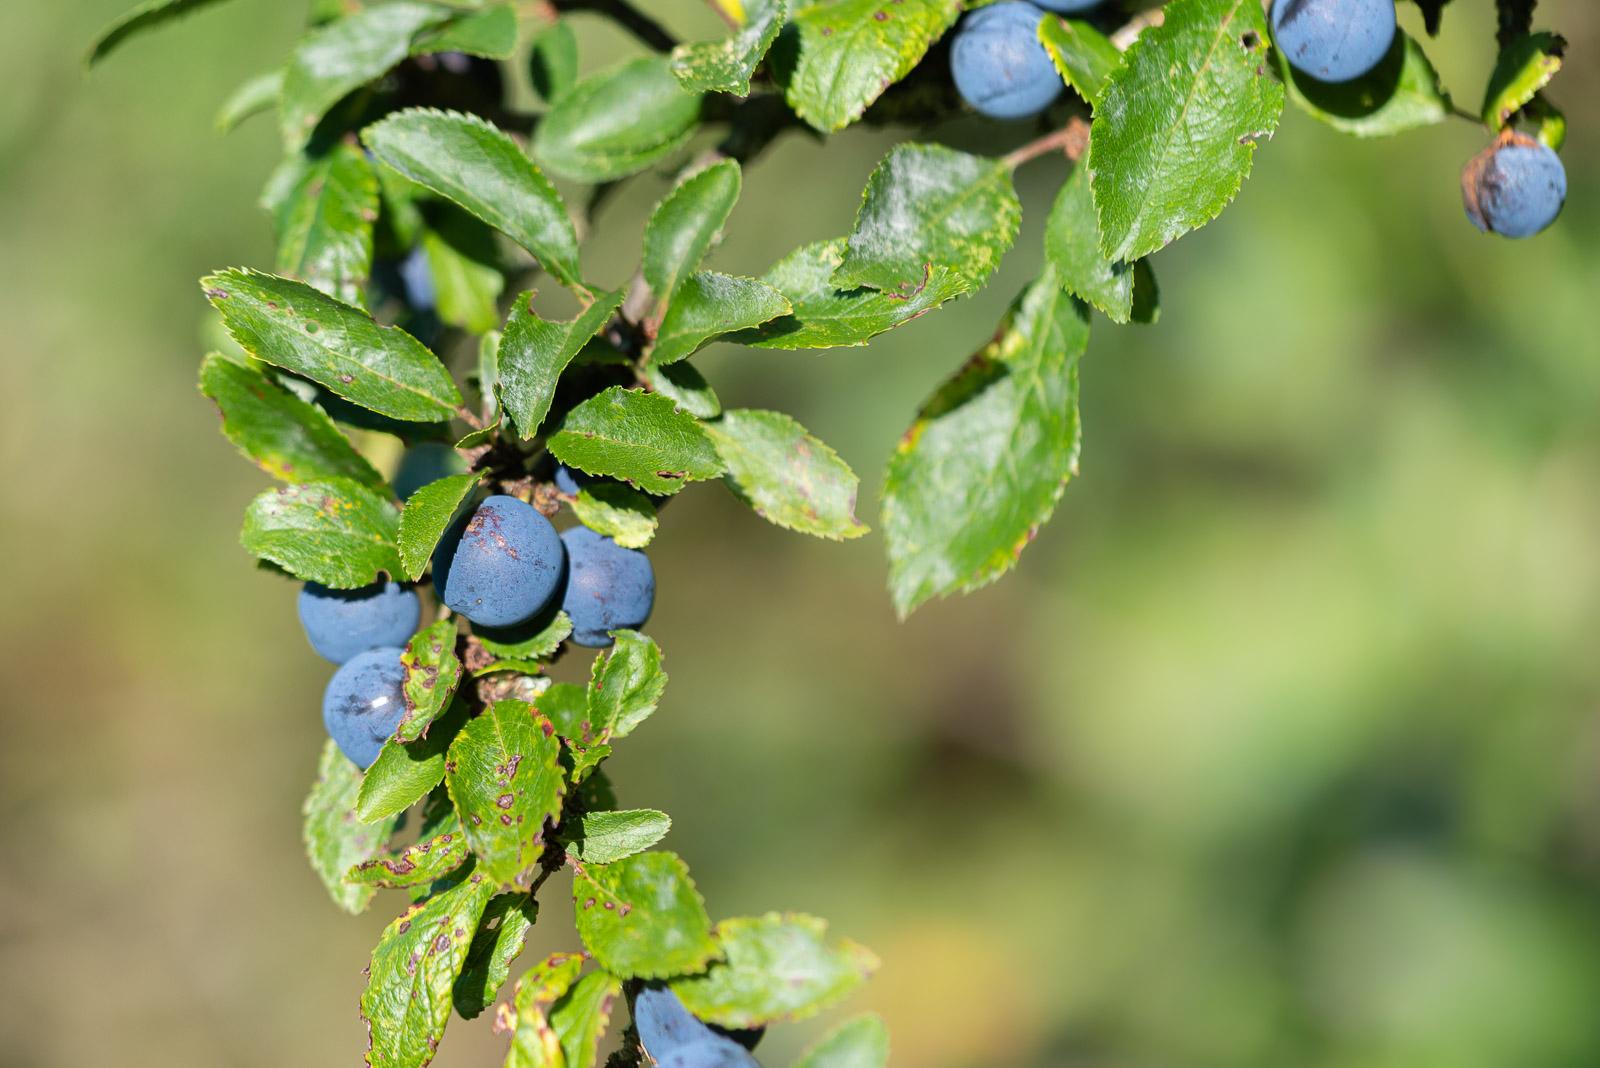 Sloe Berries - Lynchcombe, Somerset, UK. ID JB1_6062